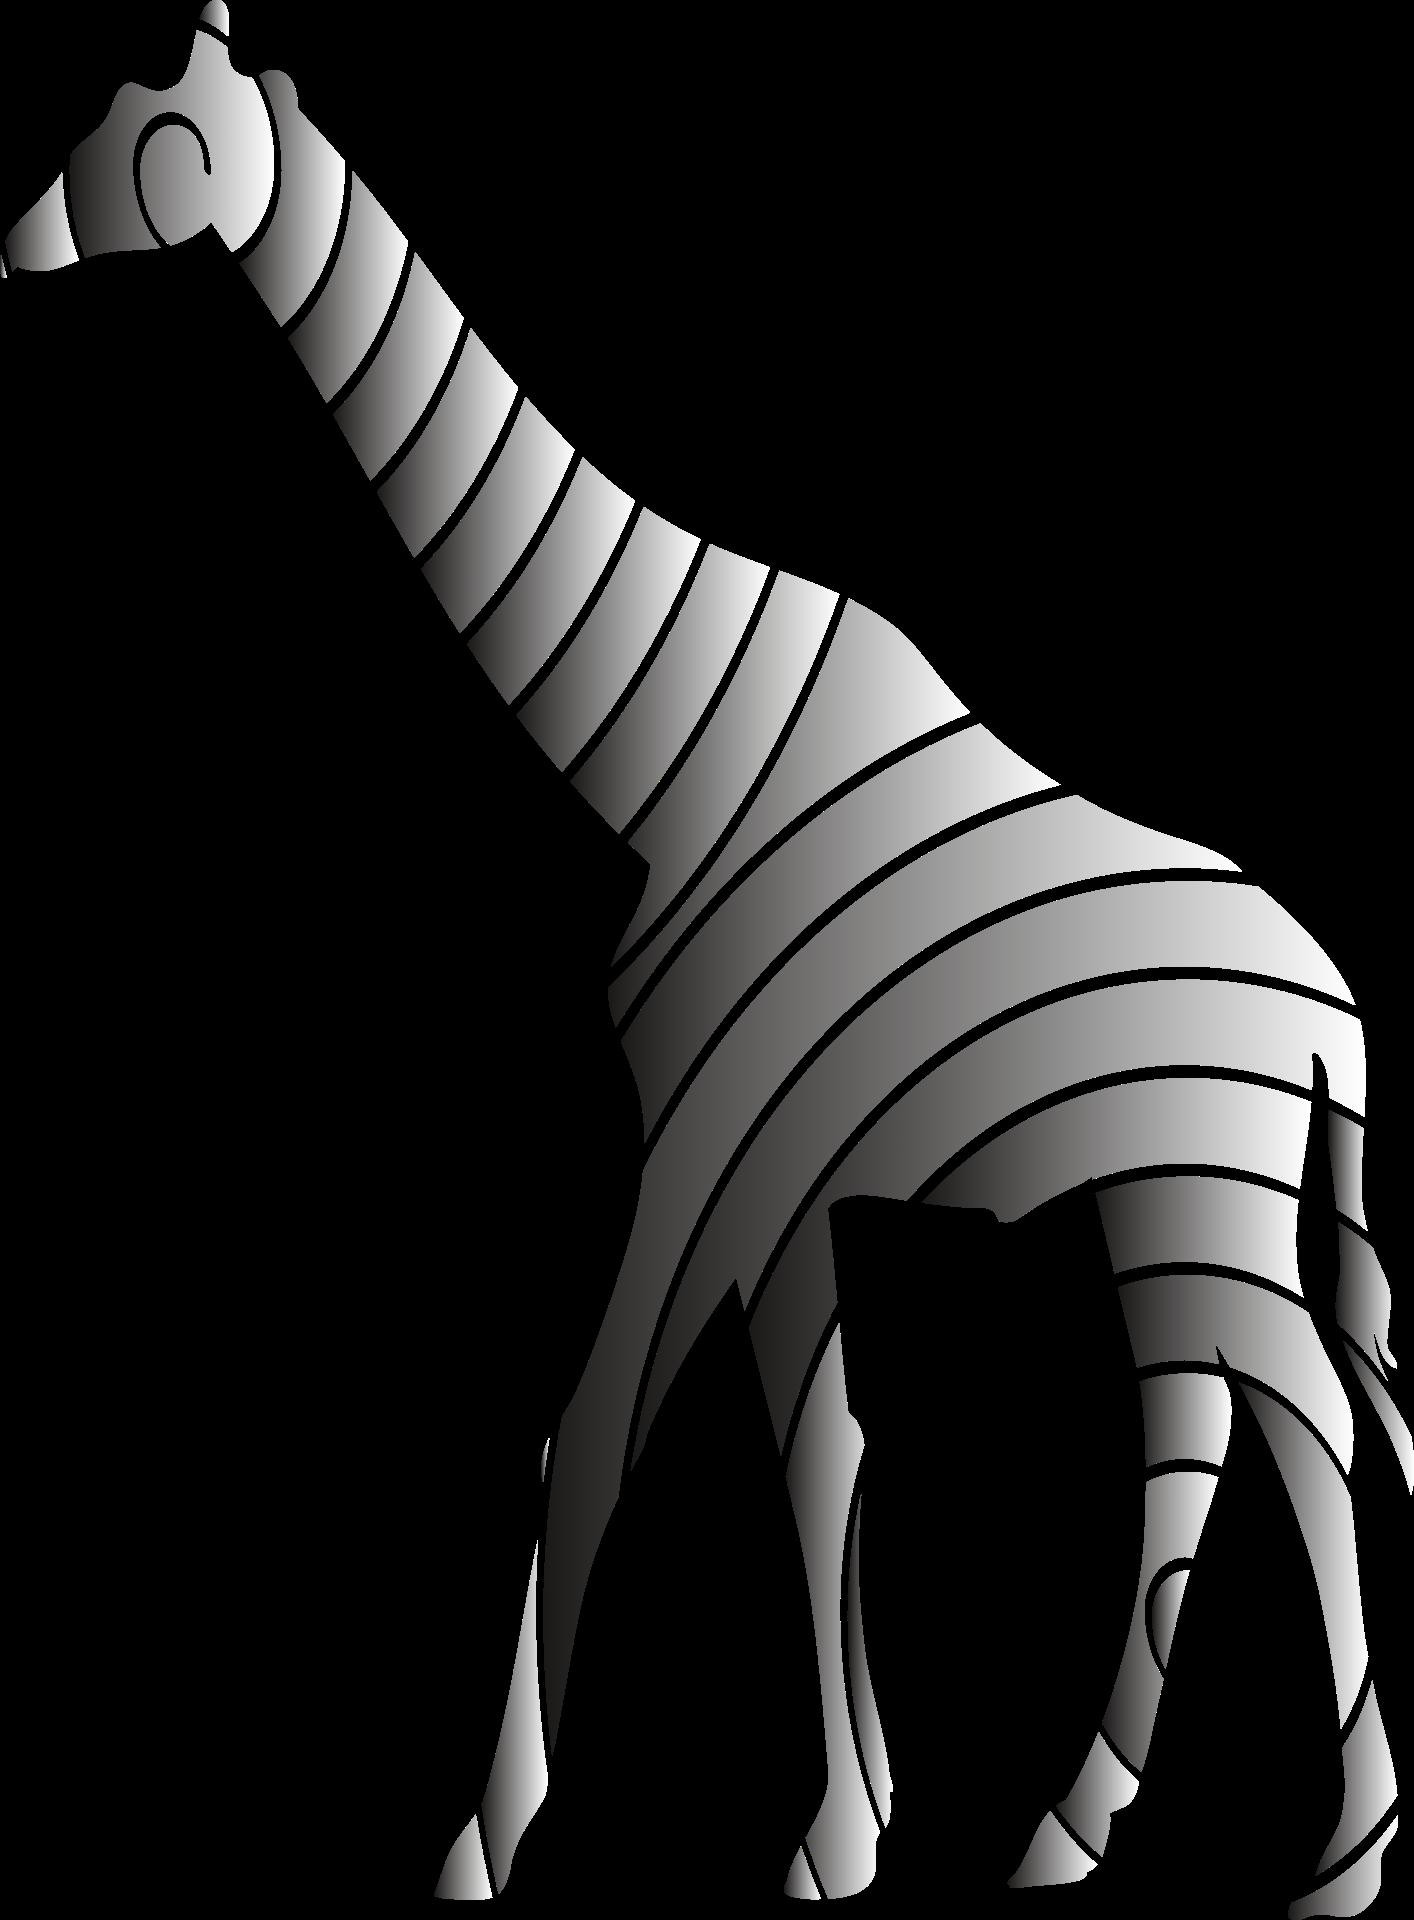 giraffe-3053267